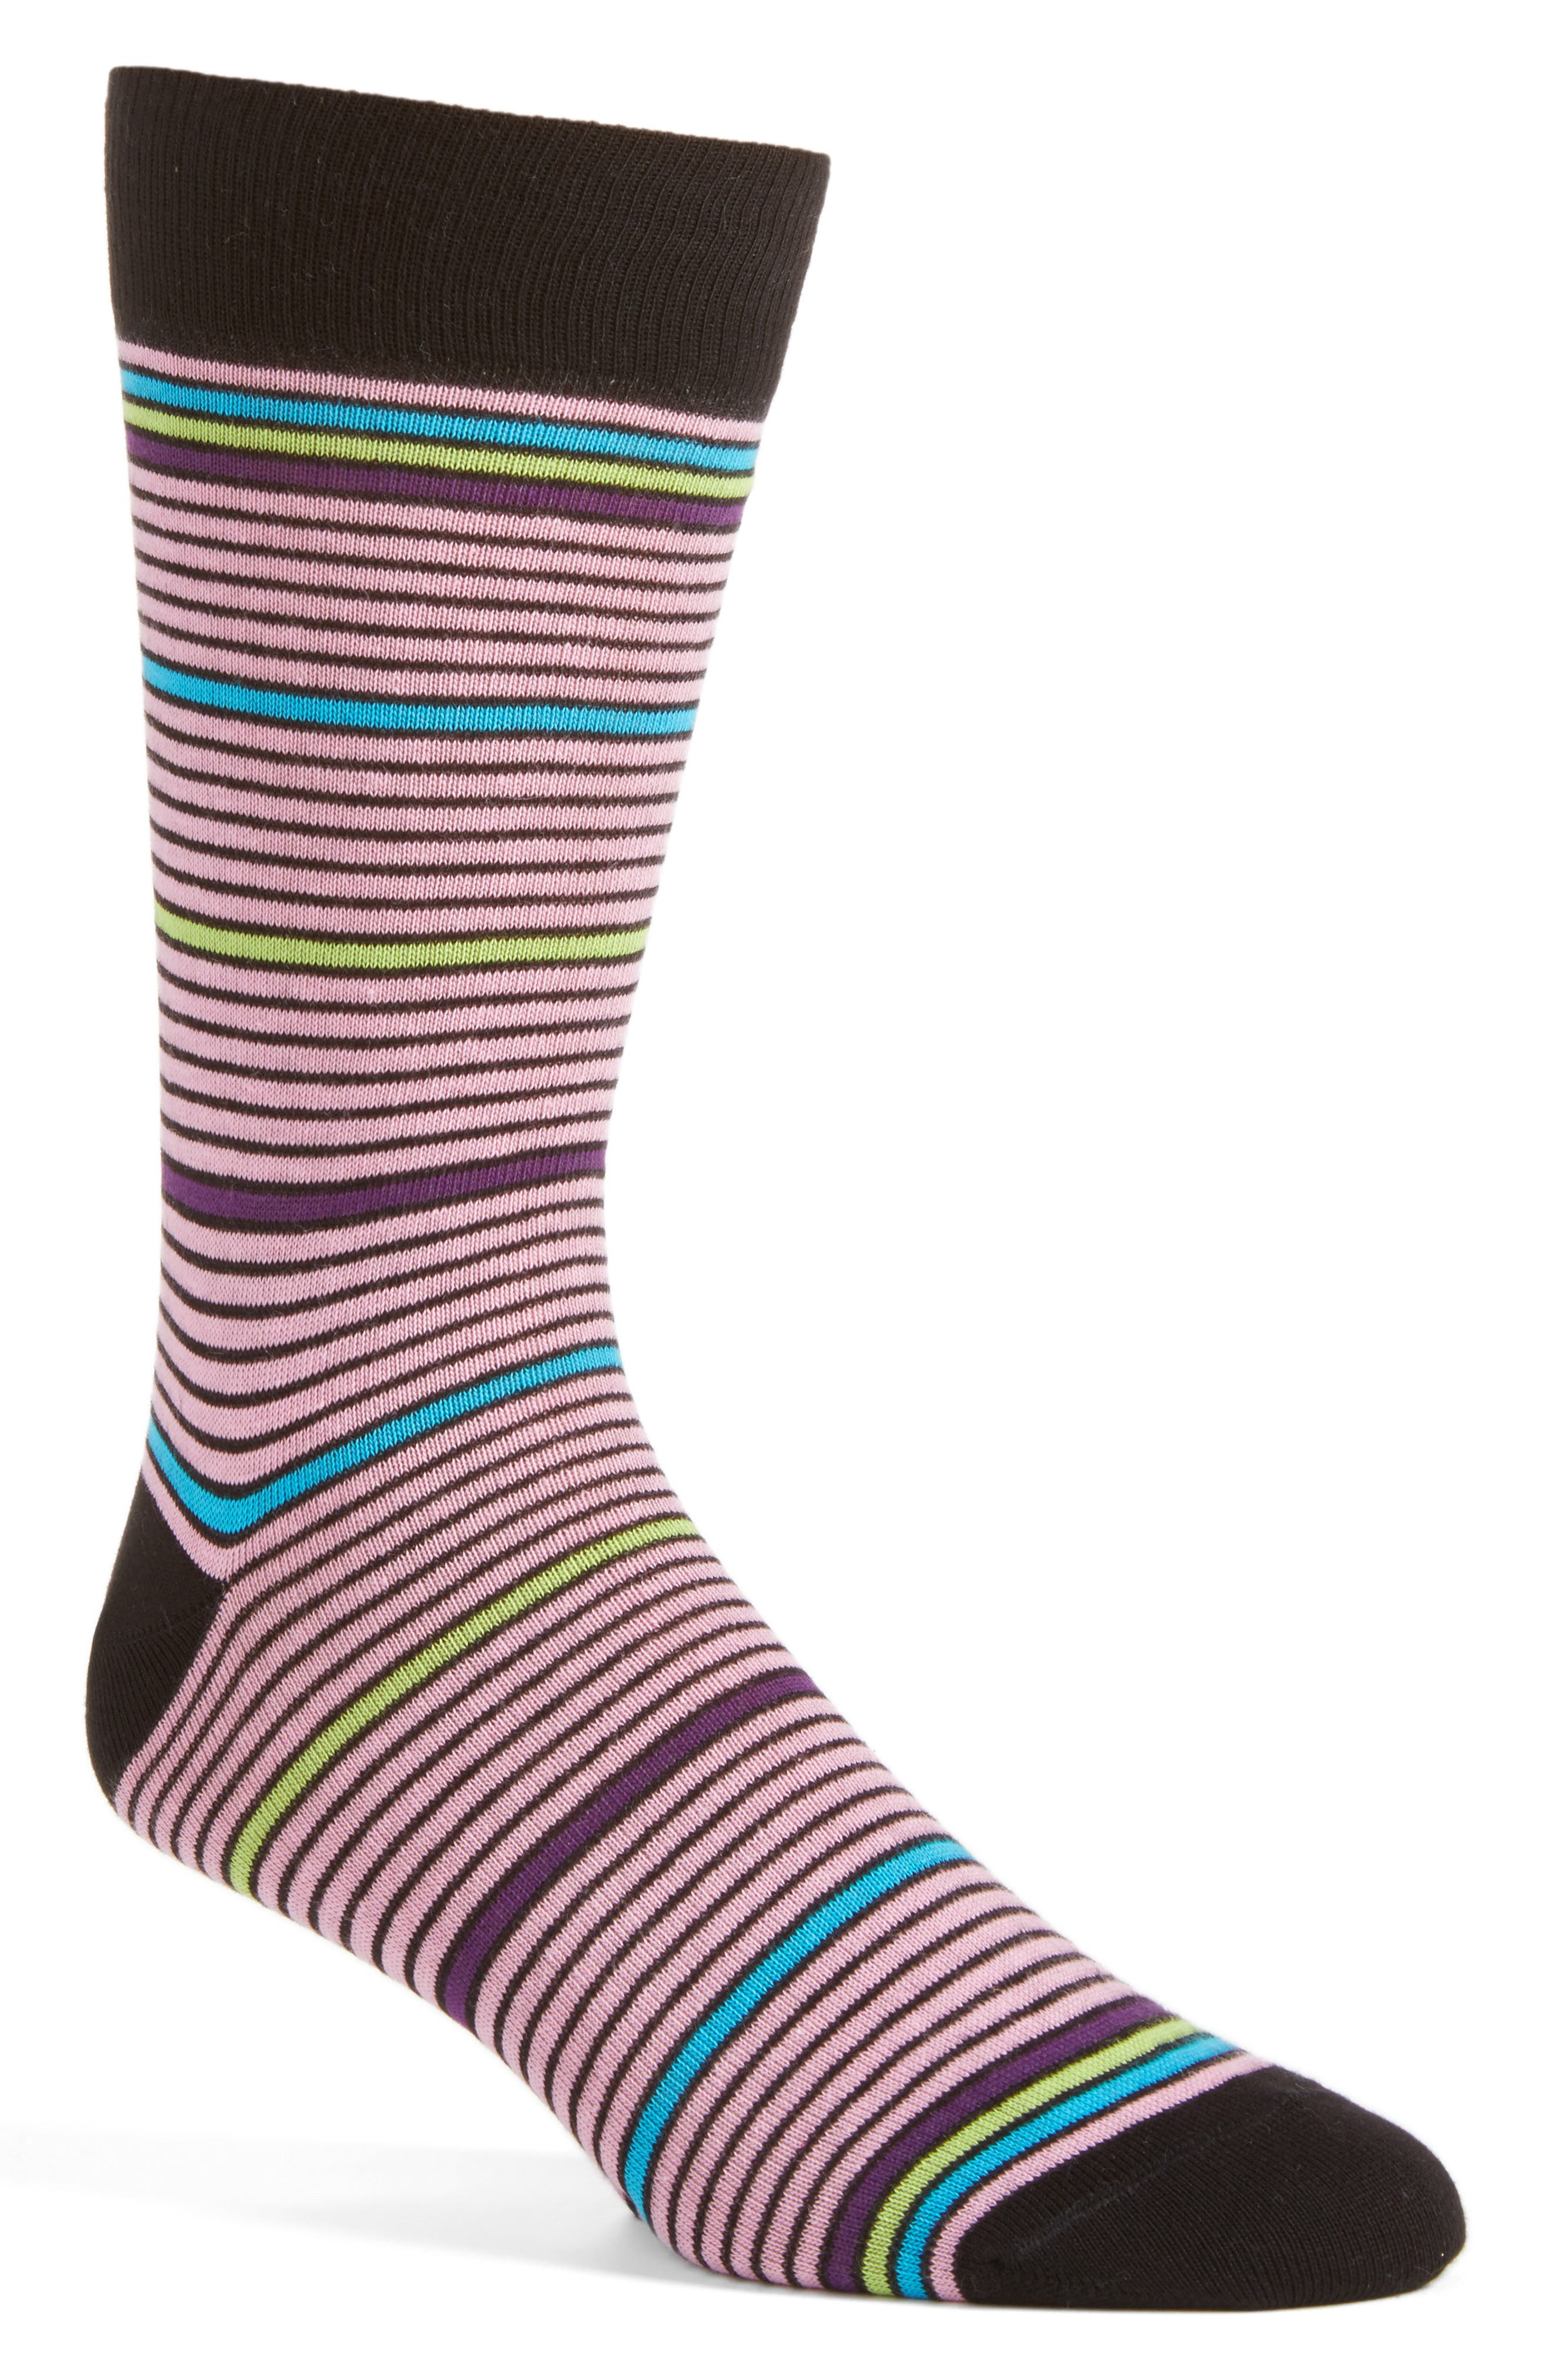 Lorenzo Uomo Stripe Crew Socks